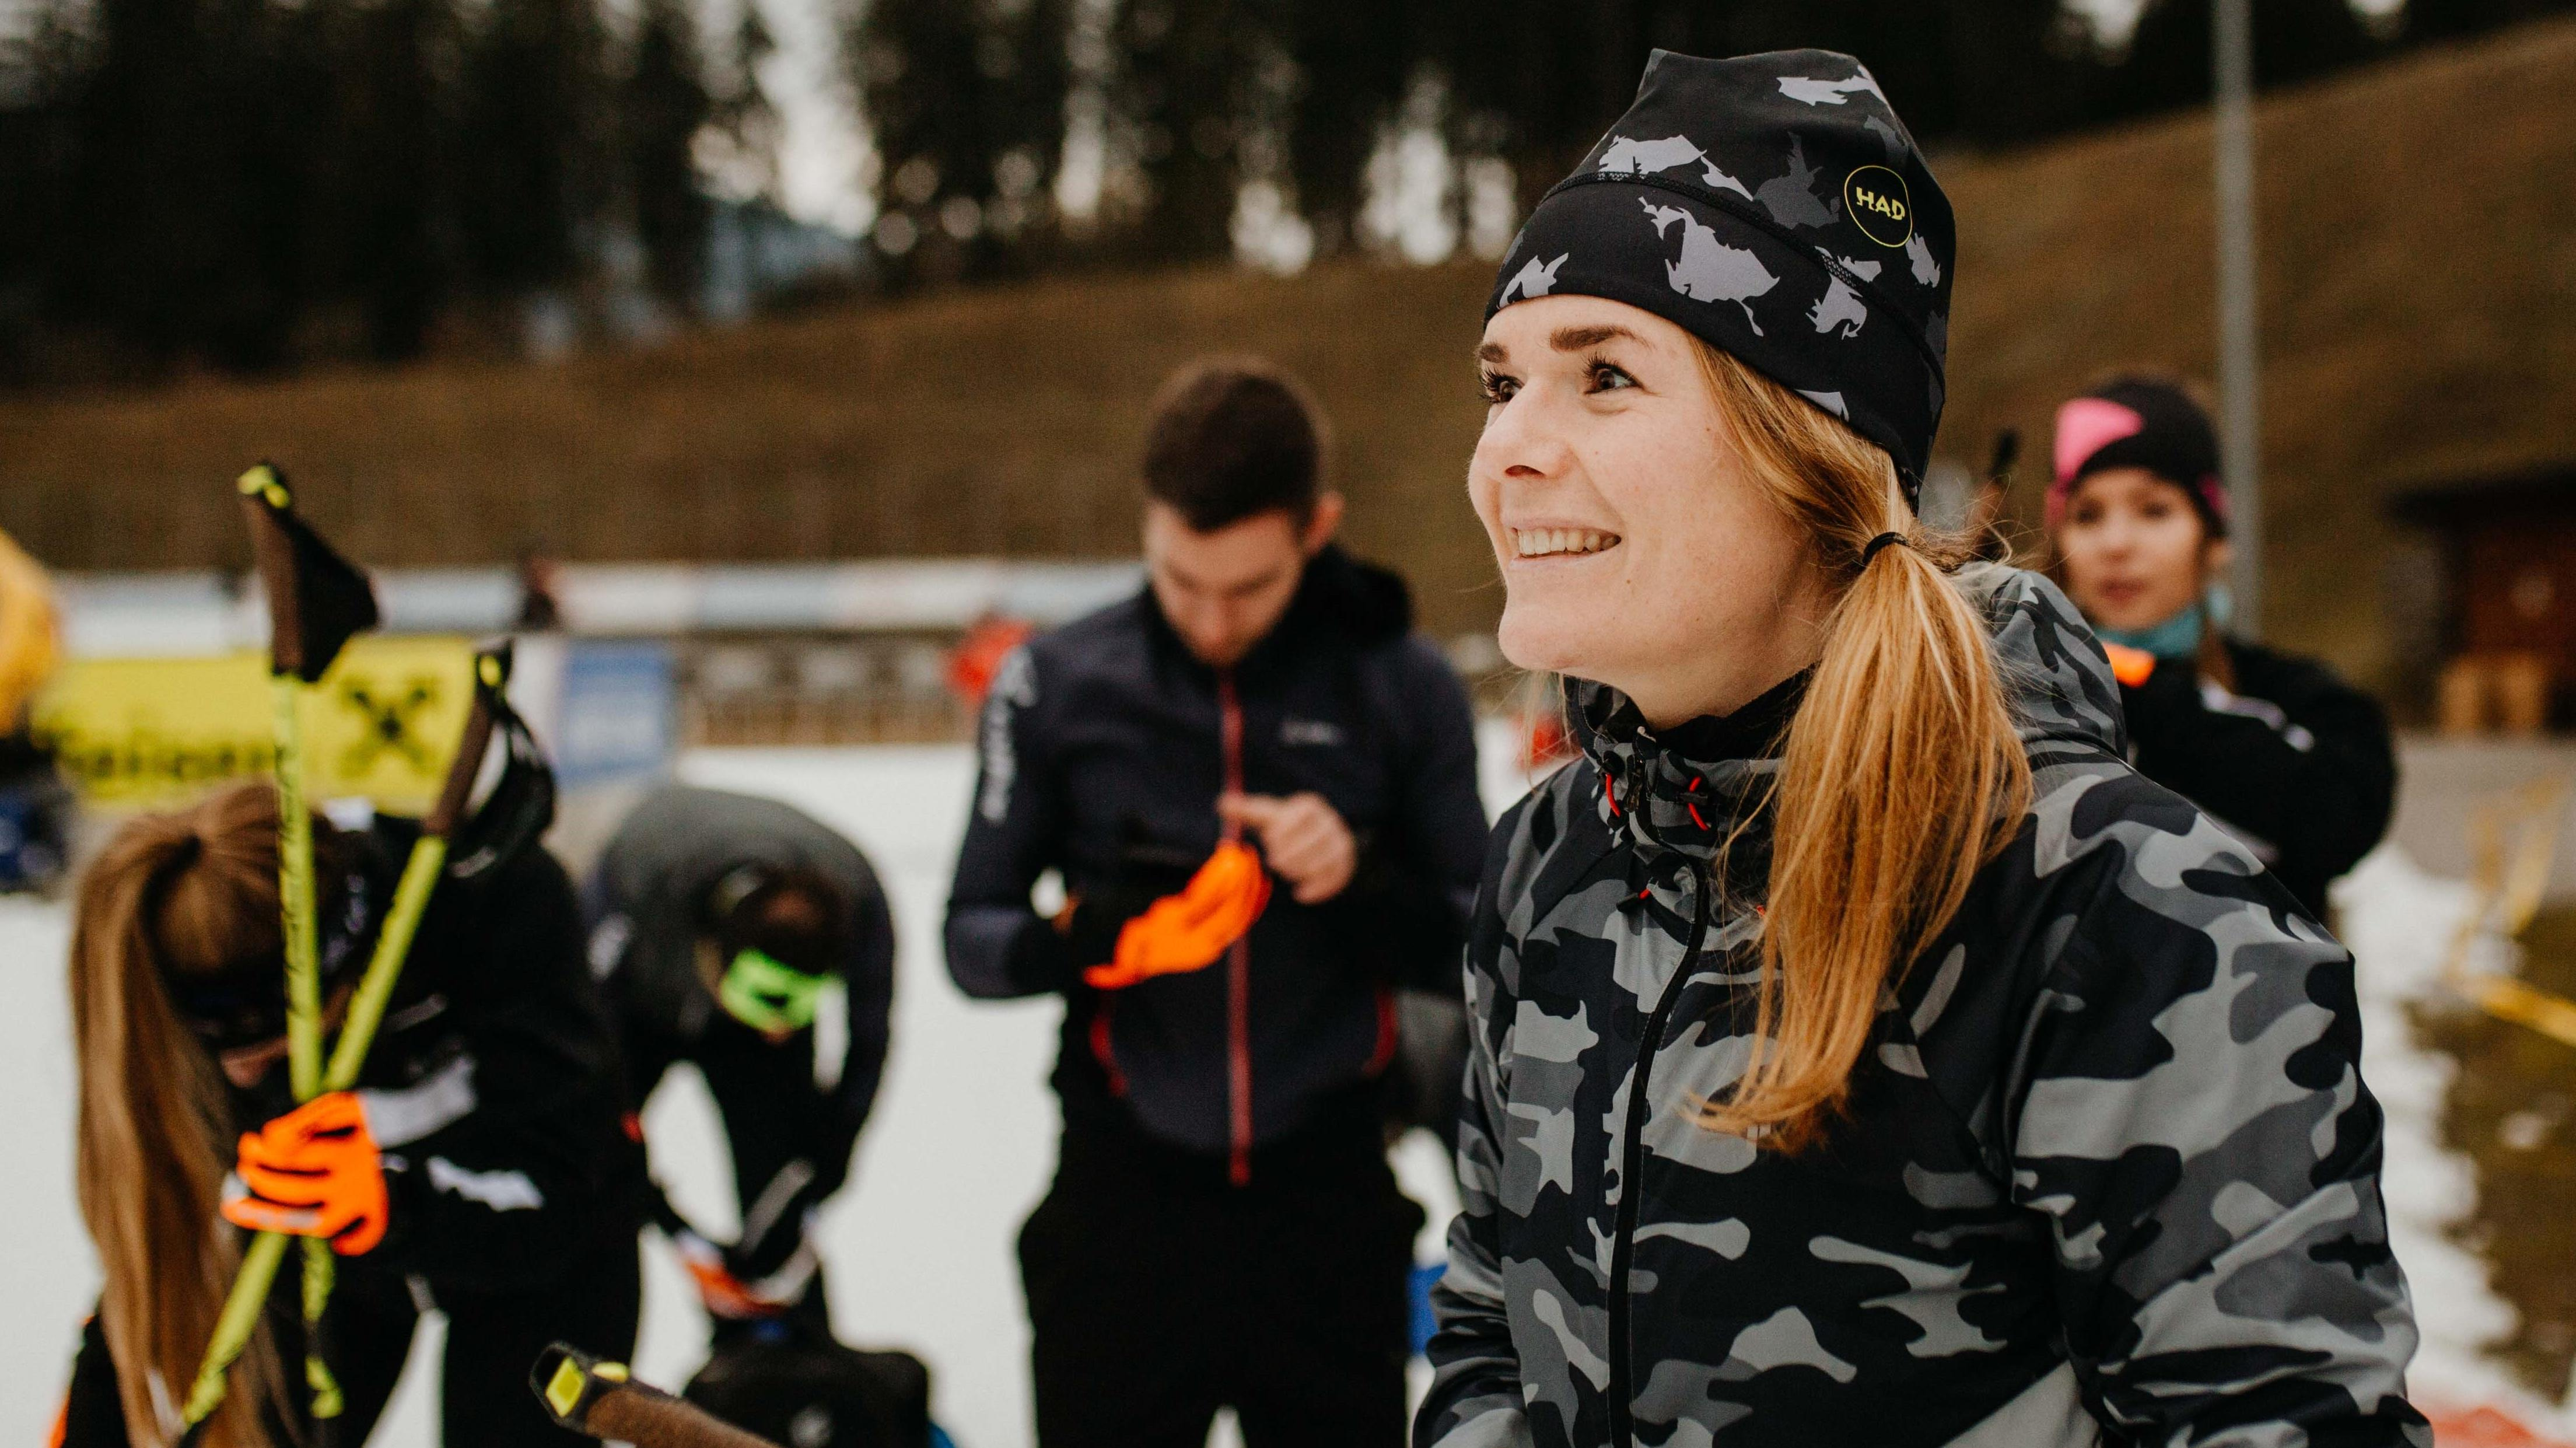 Katharina Kestler